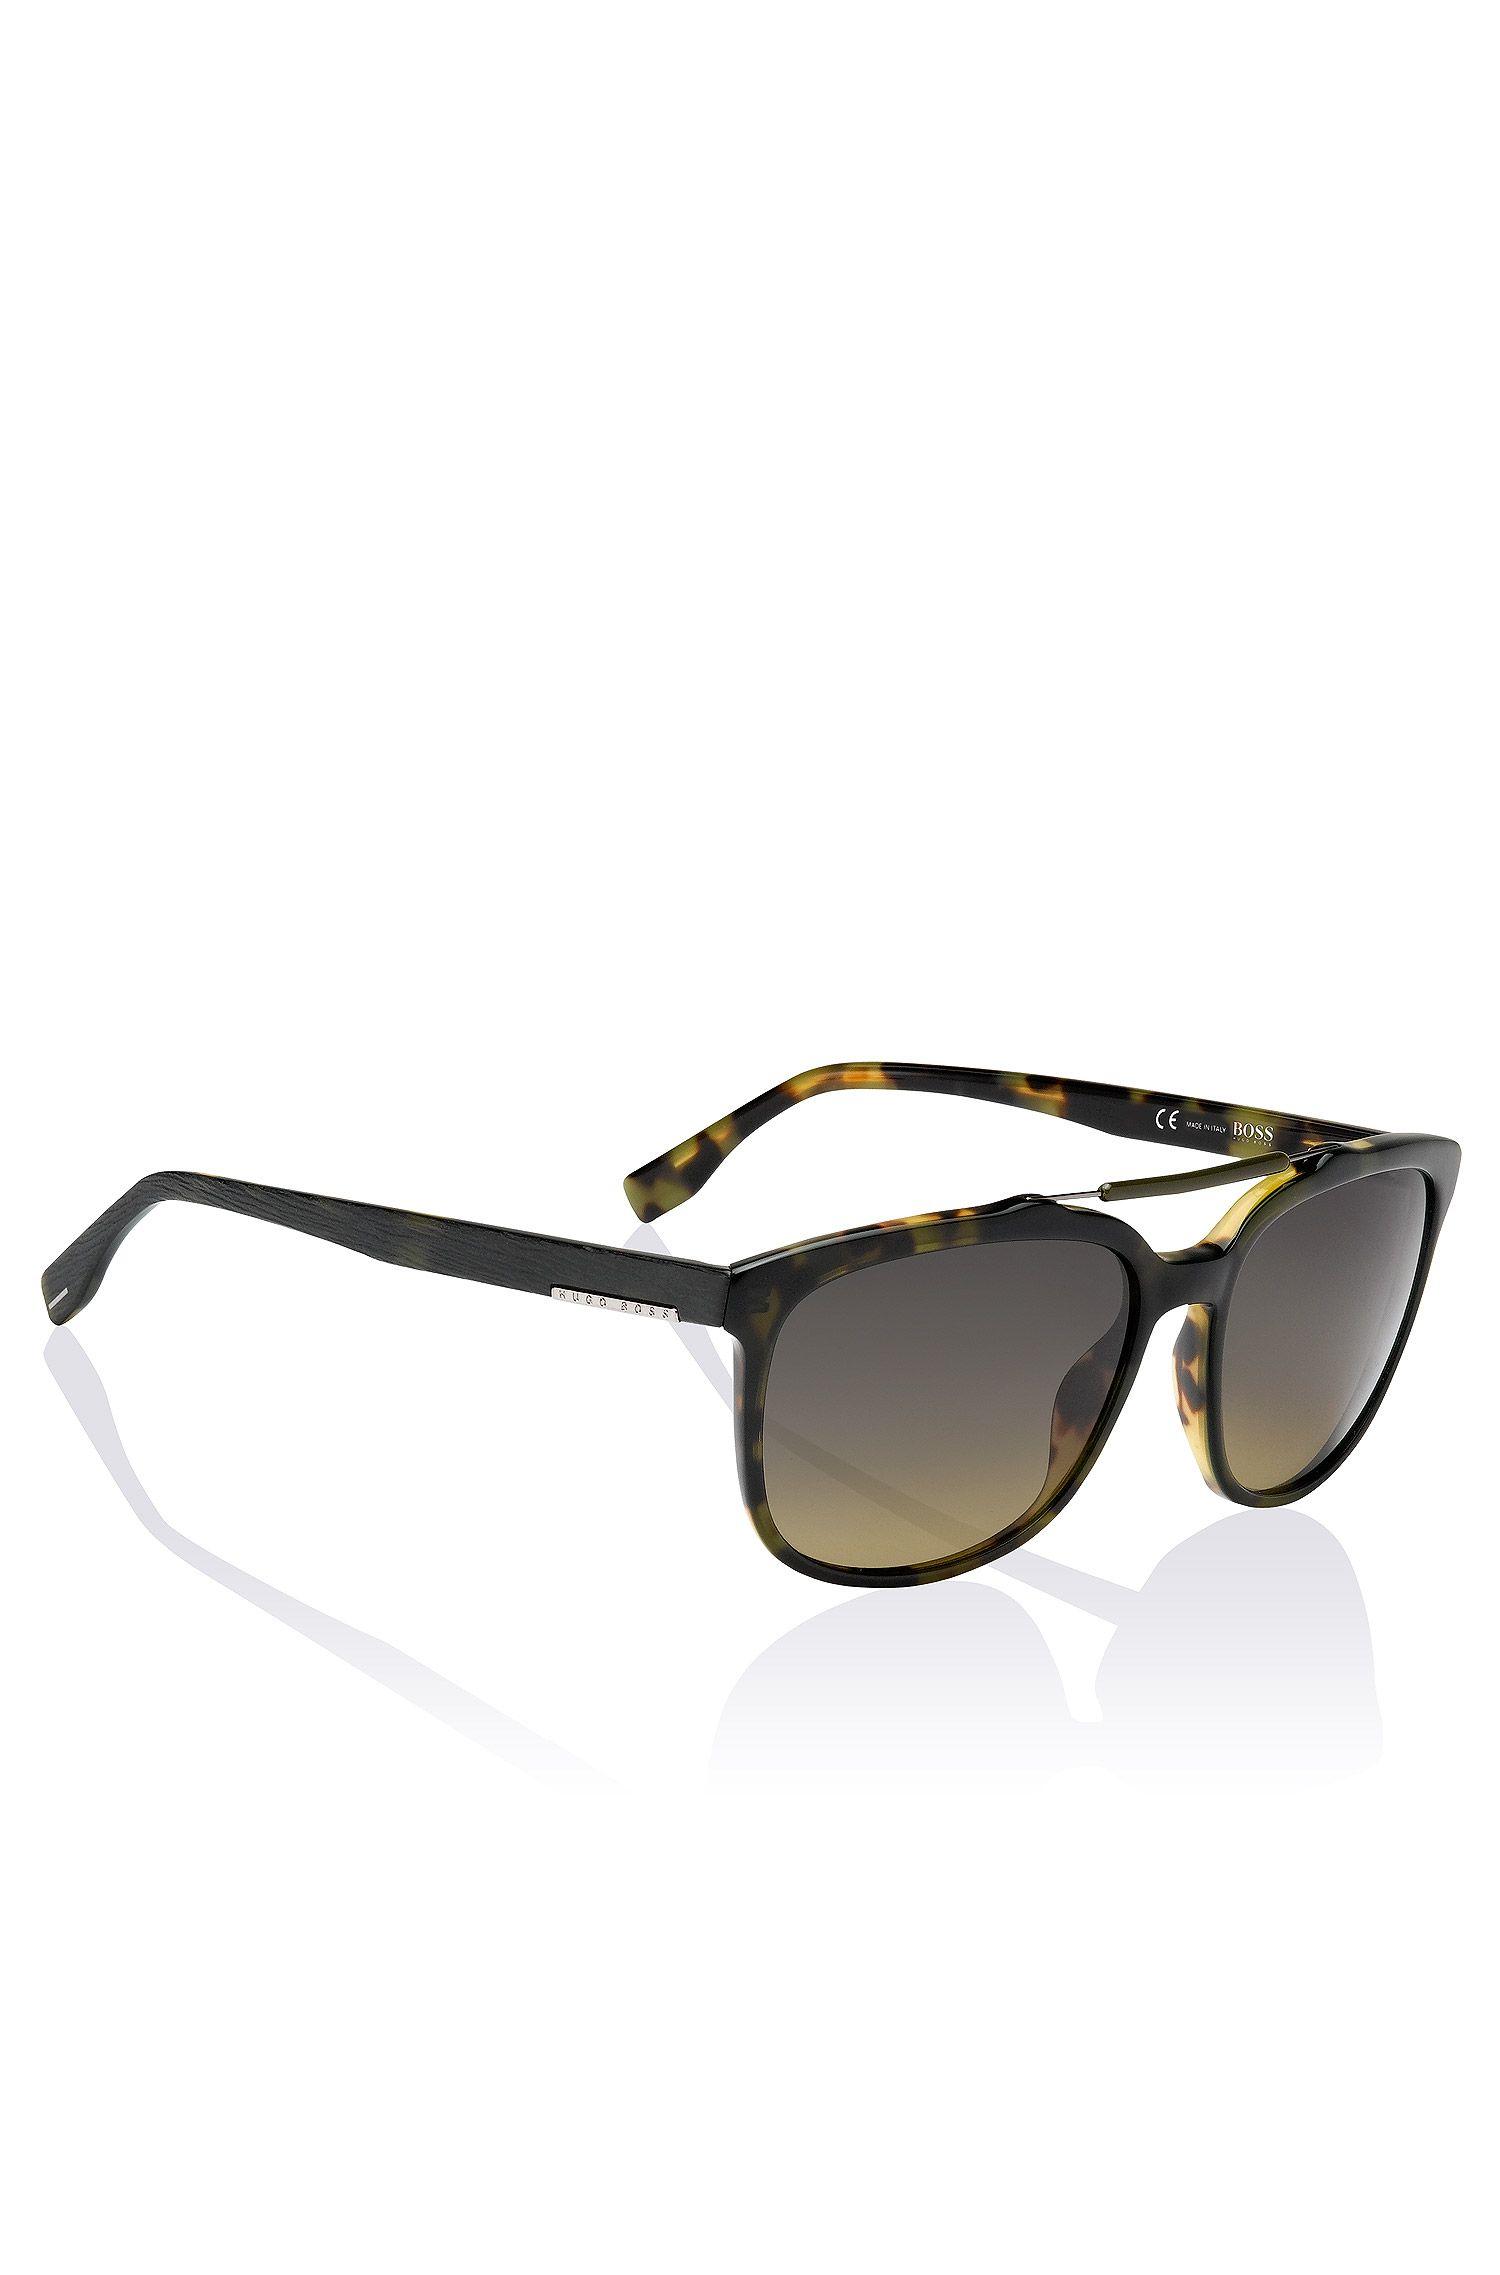 Gafas de sol 'BOSS 0636/S' en acetato